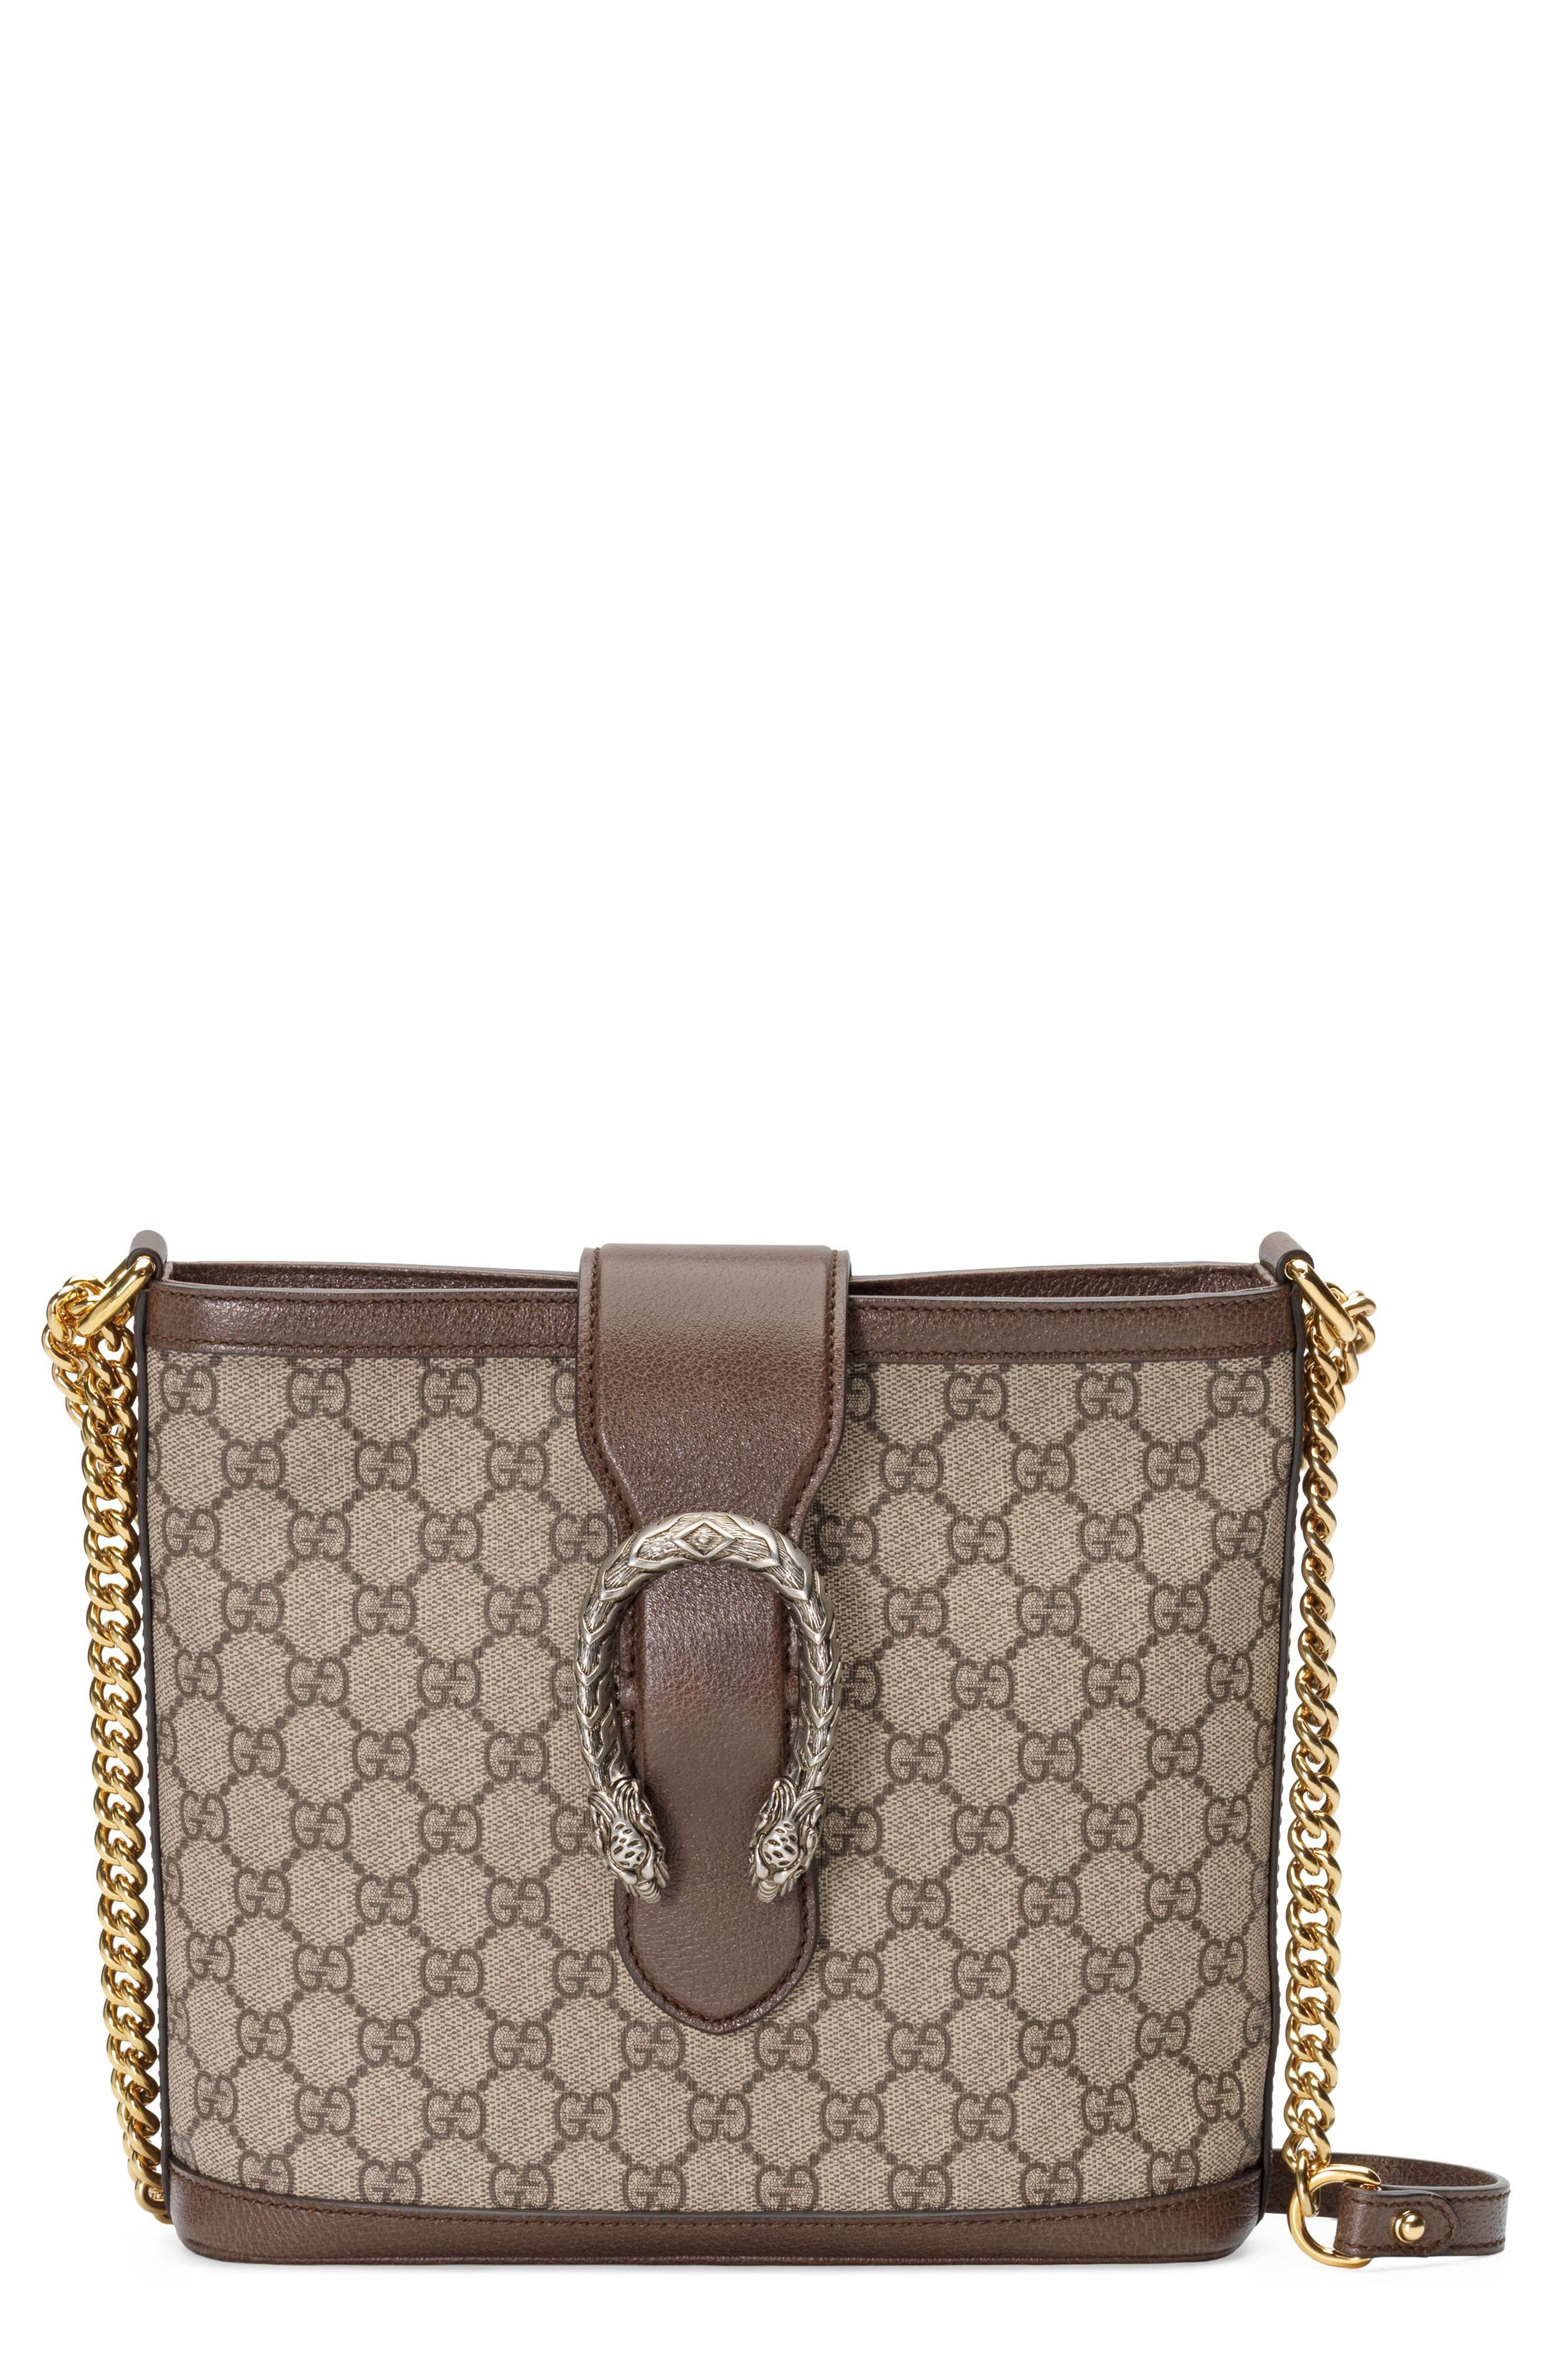 6abb593a44d Gucci Dionysus Medium Gg Supreme Canvas Bucket Bag In Brown